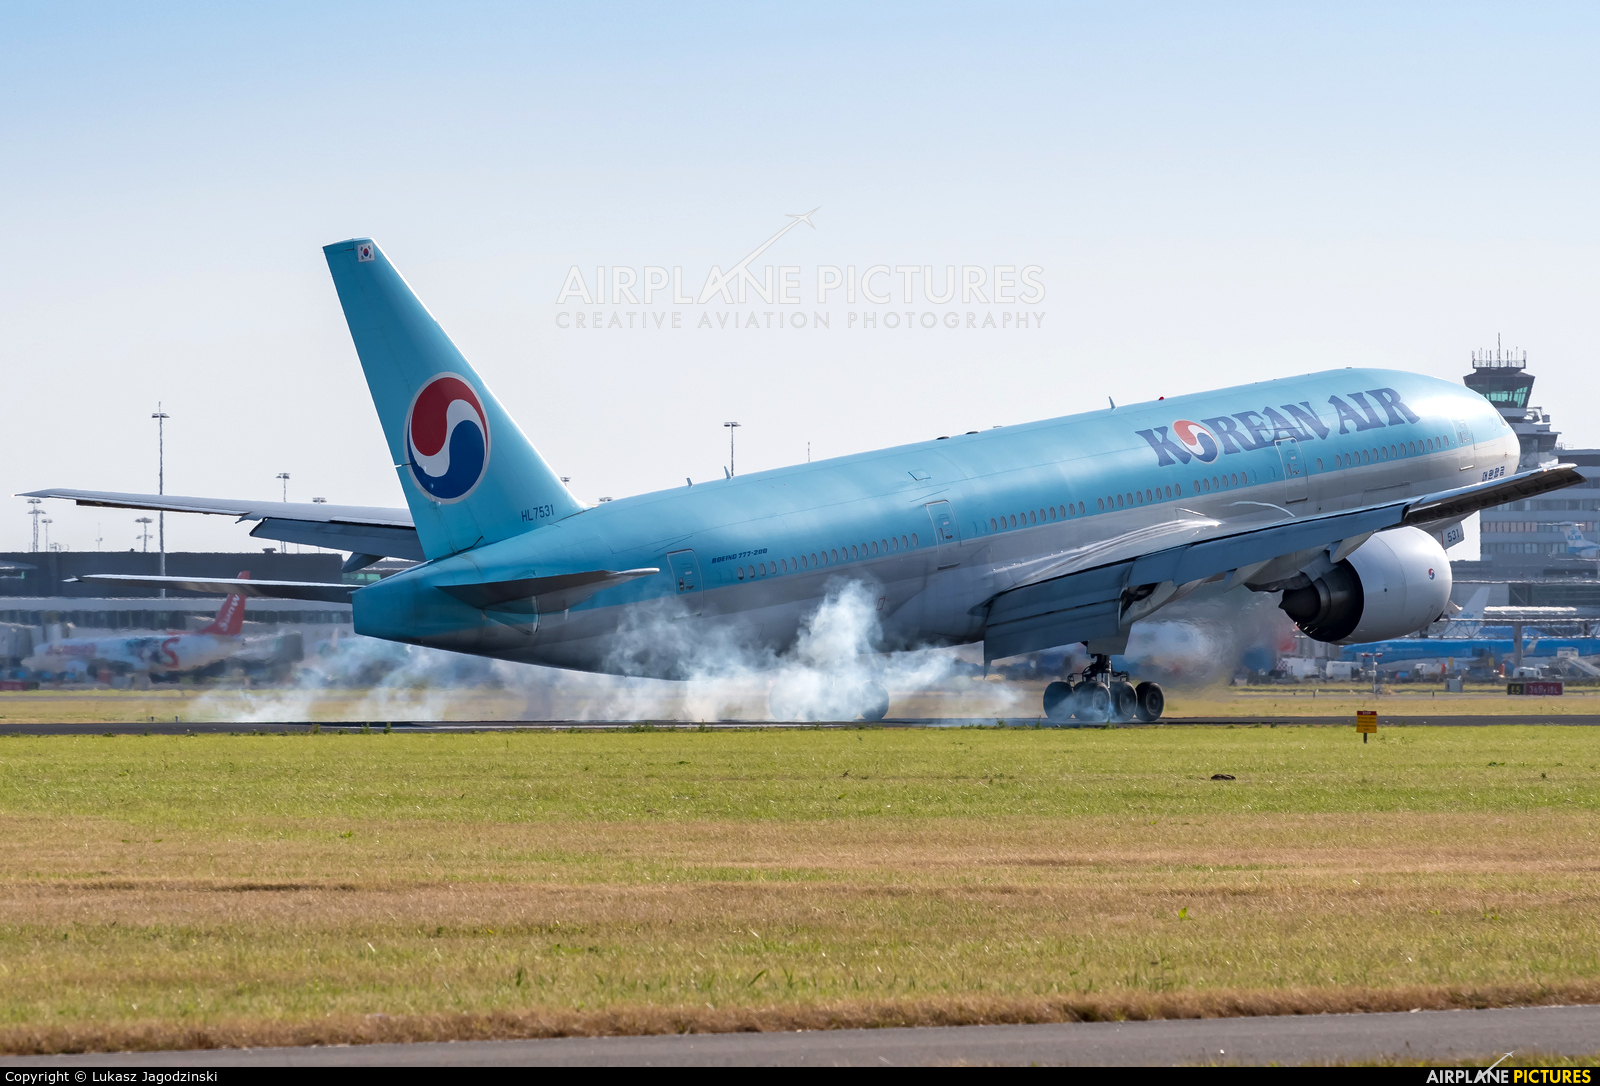 Korean Air HL7531 aircraft at Amsterdam - Schiphol